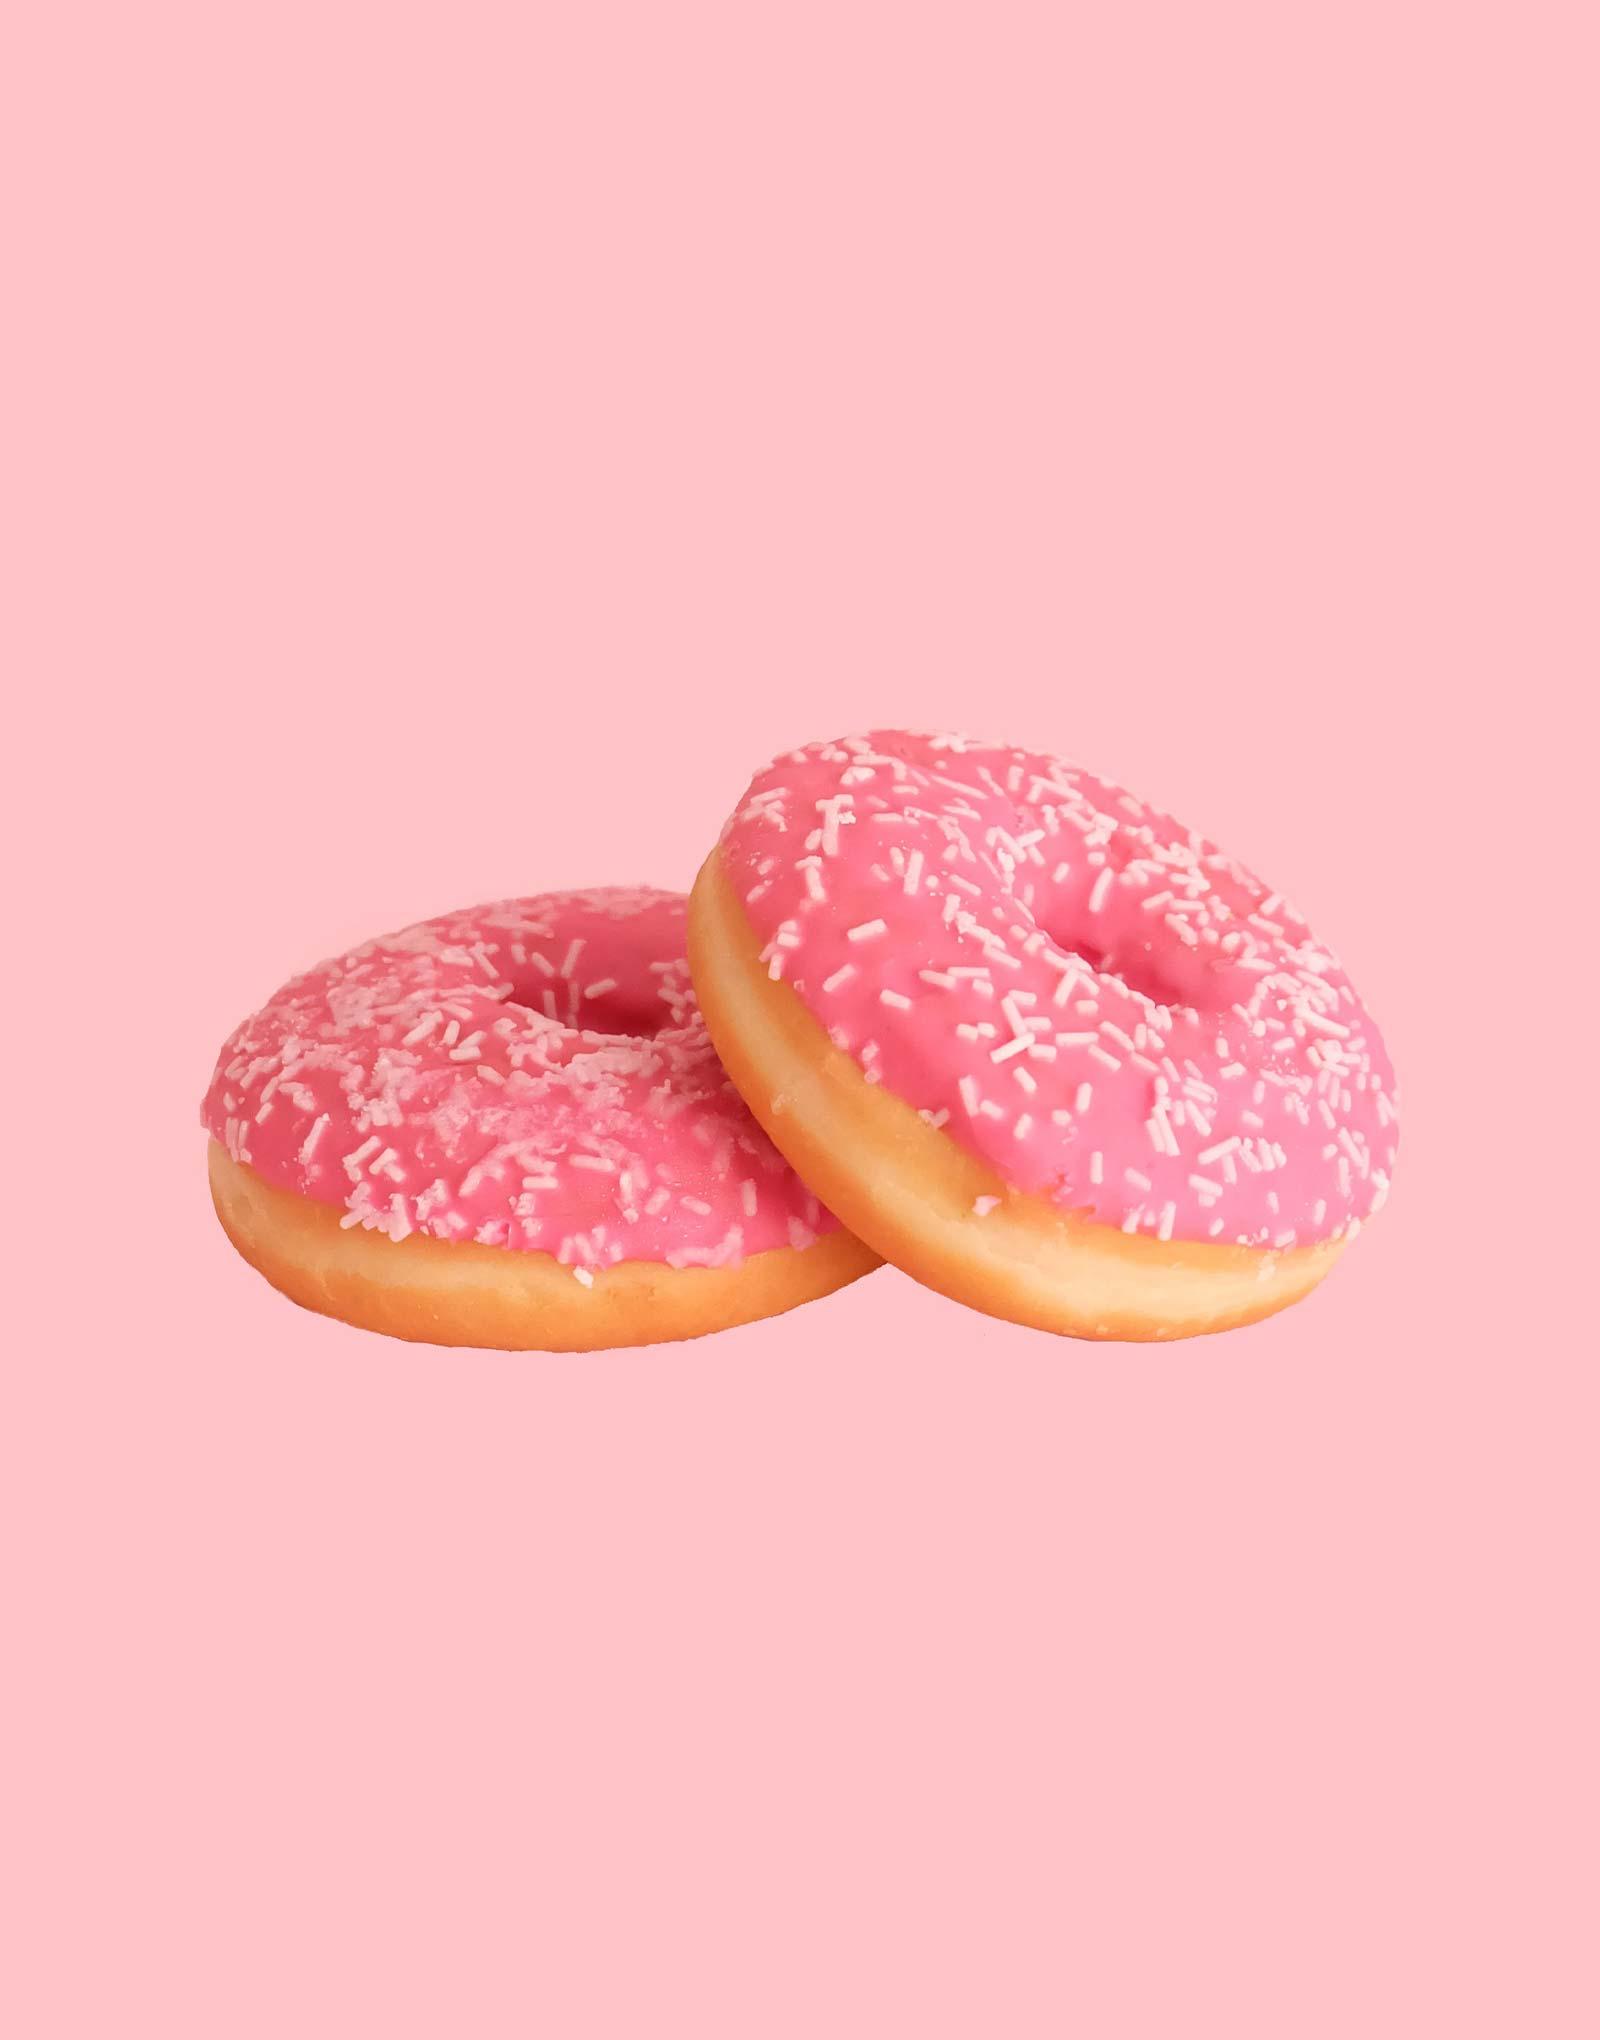 strawberry-donut